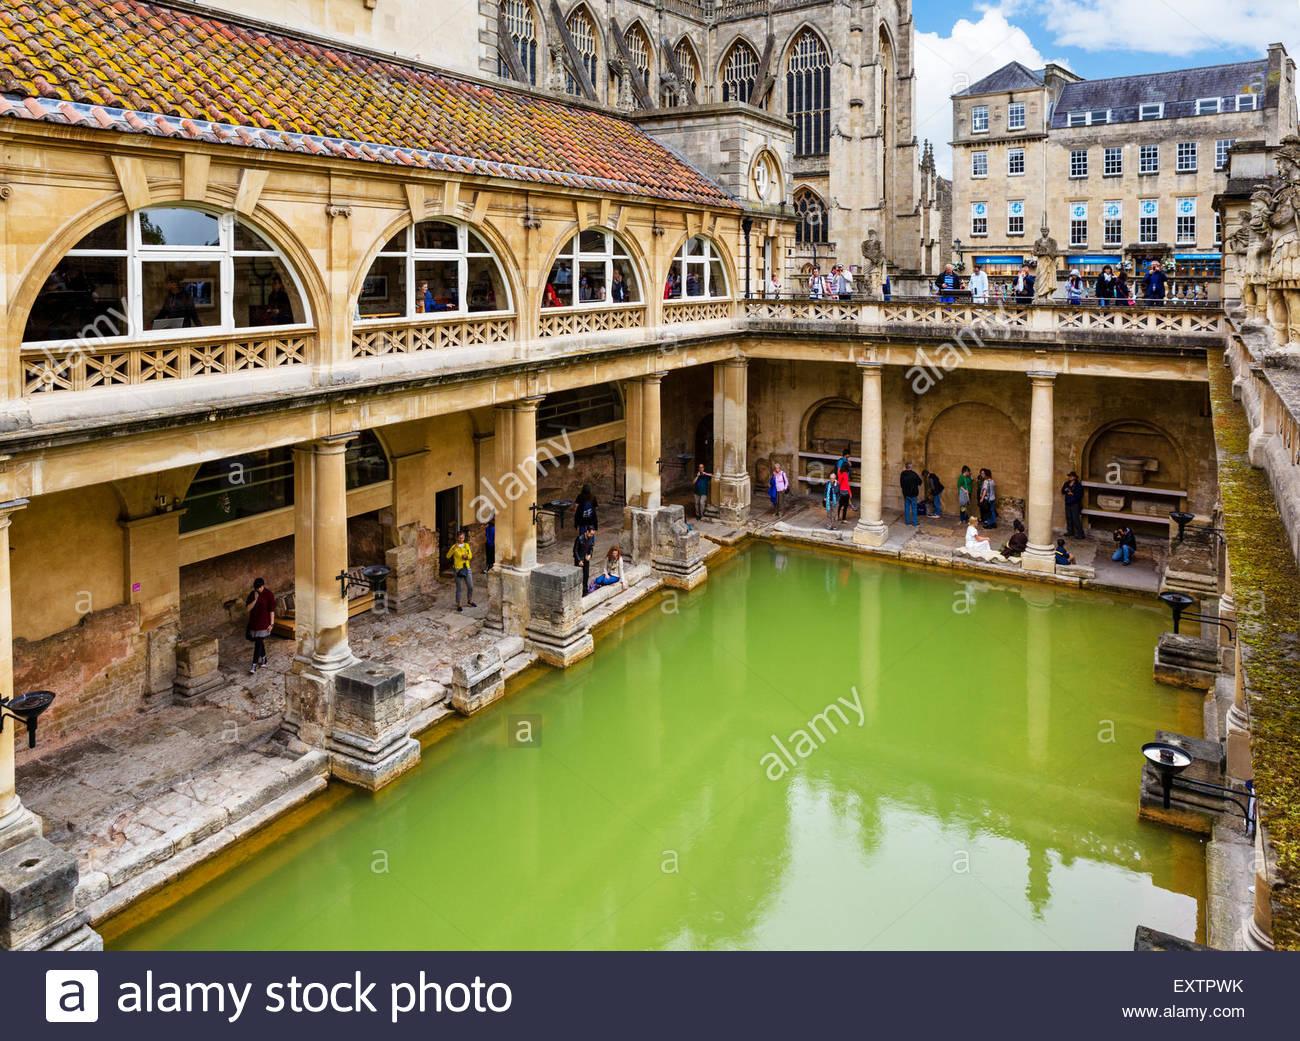 the-great-bath-at-the-roman-baths-in-bath-somerset-england-uk-EXTPWK